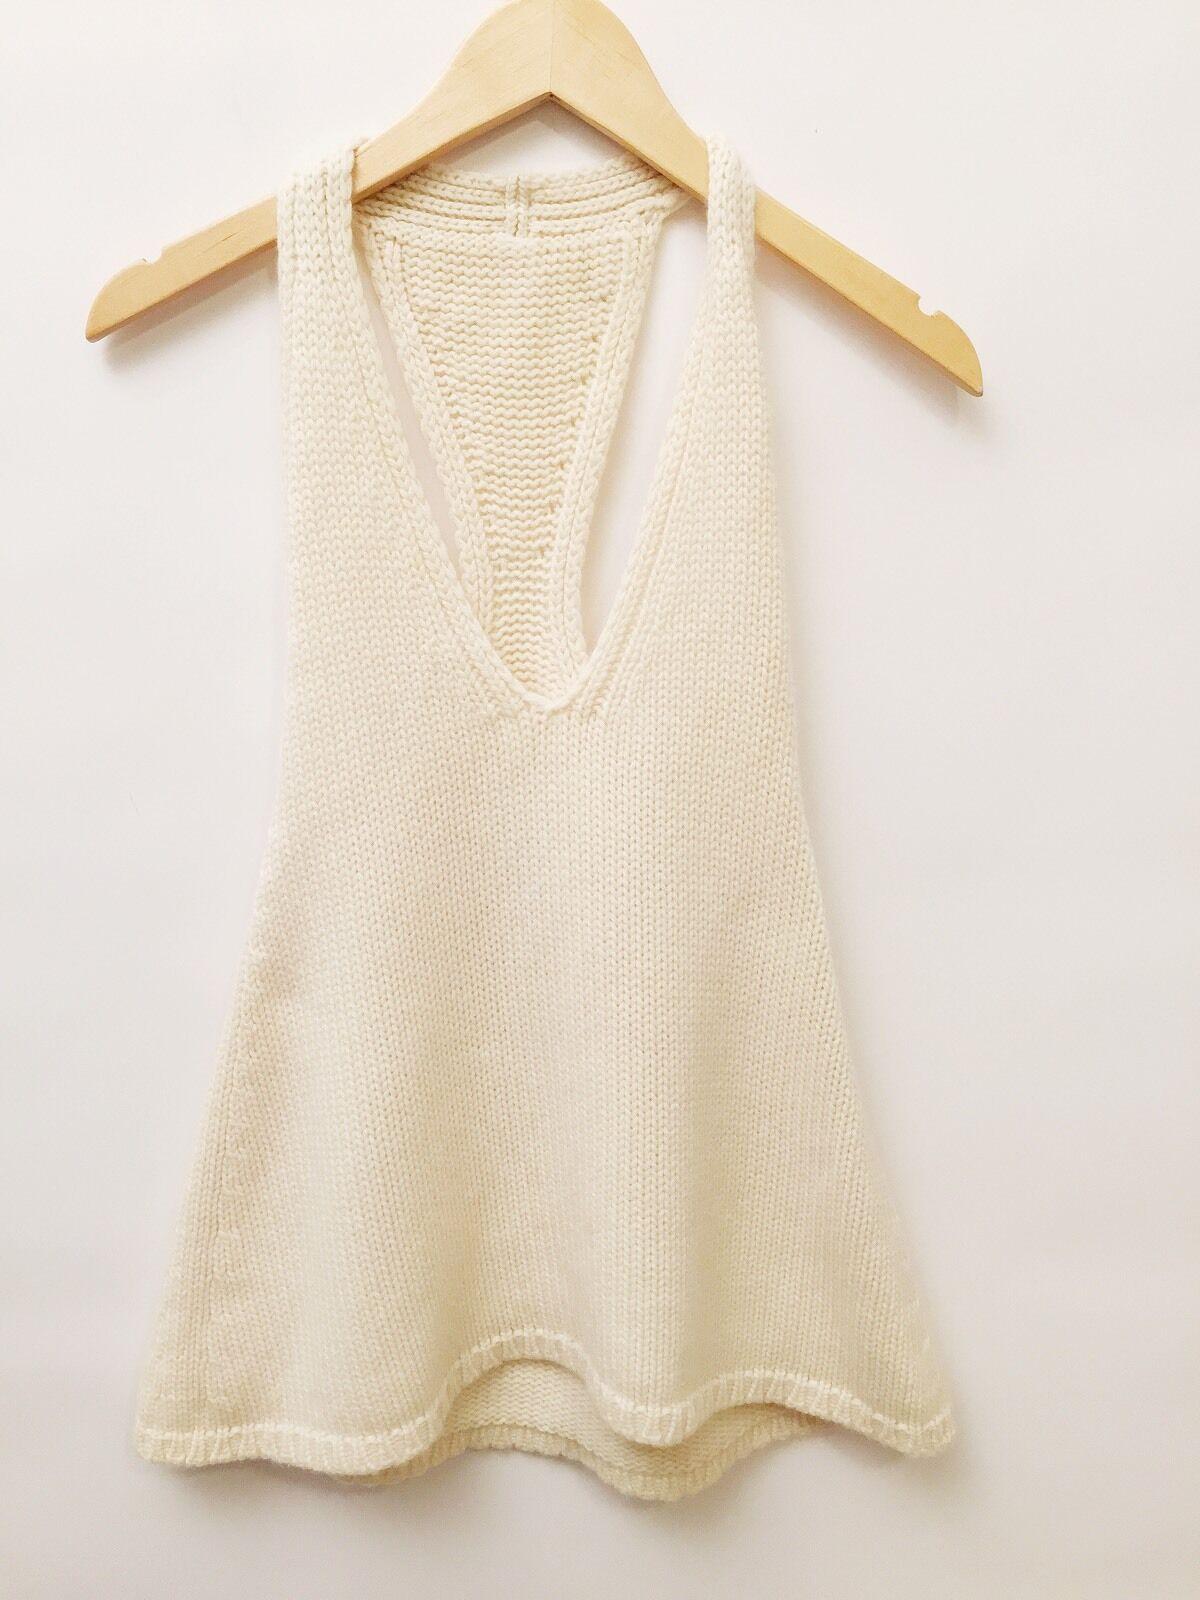 Small Cream Knit Halter Top